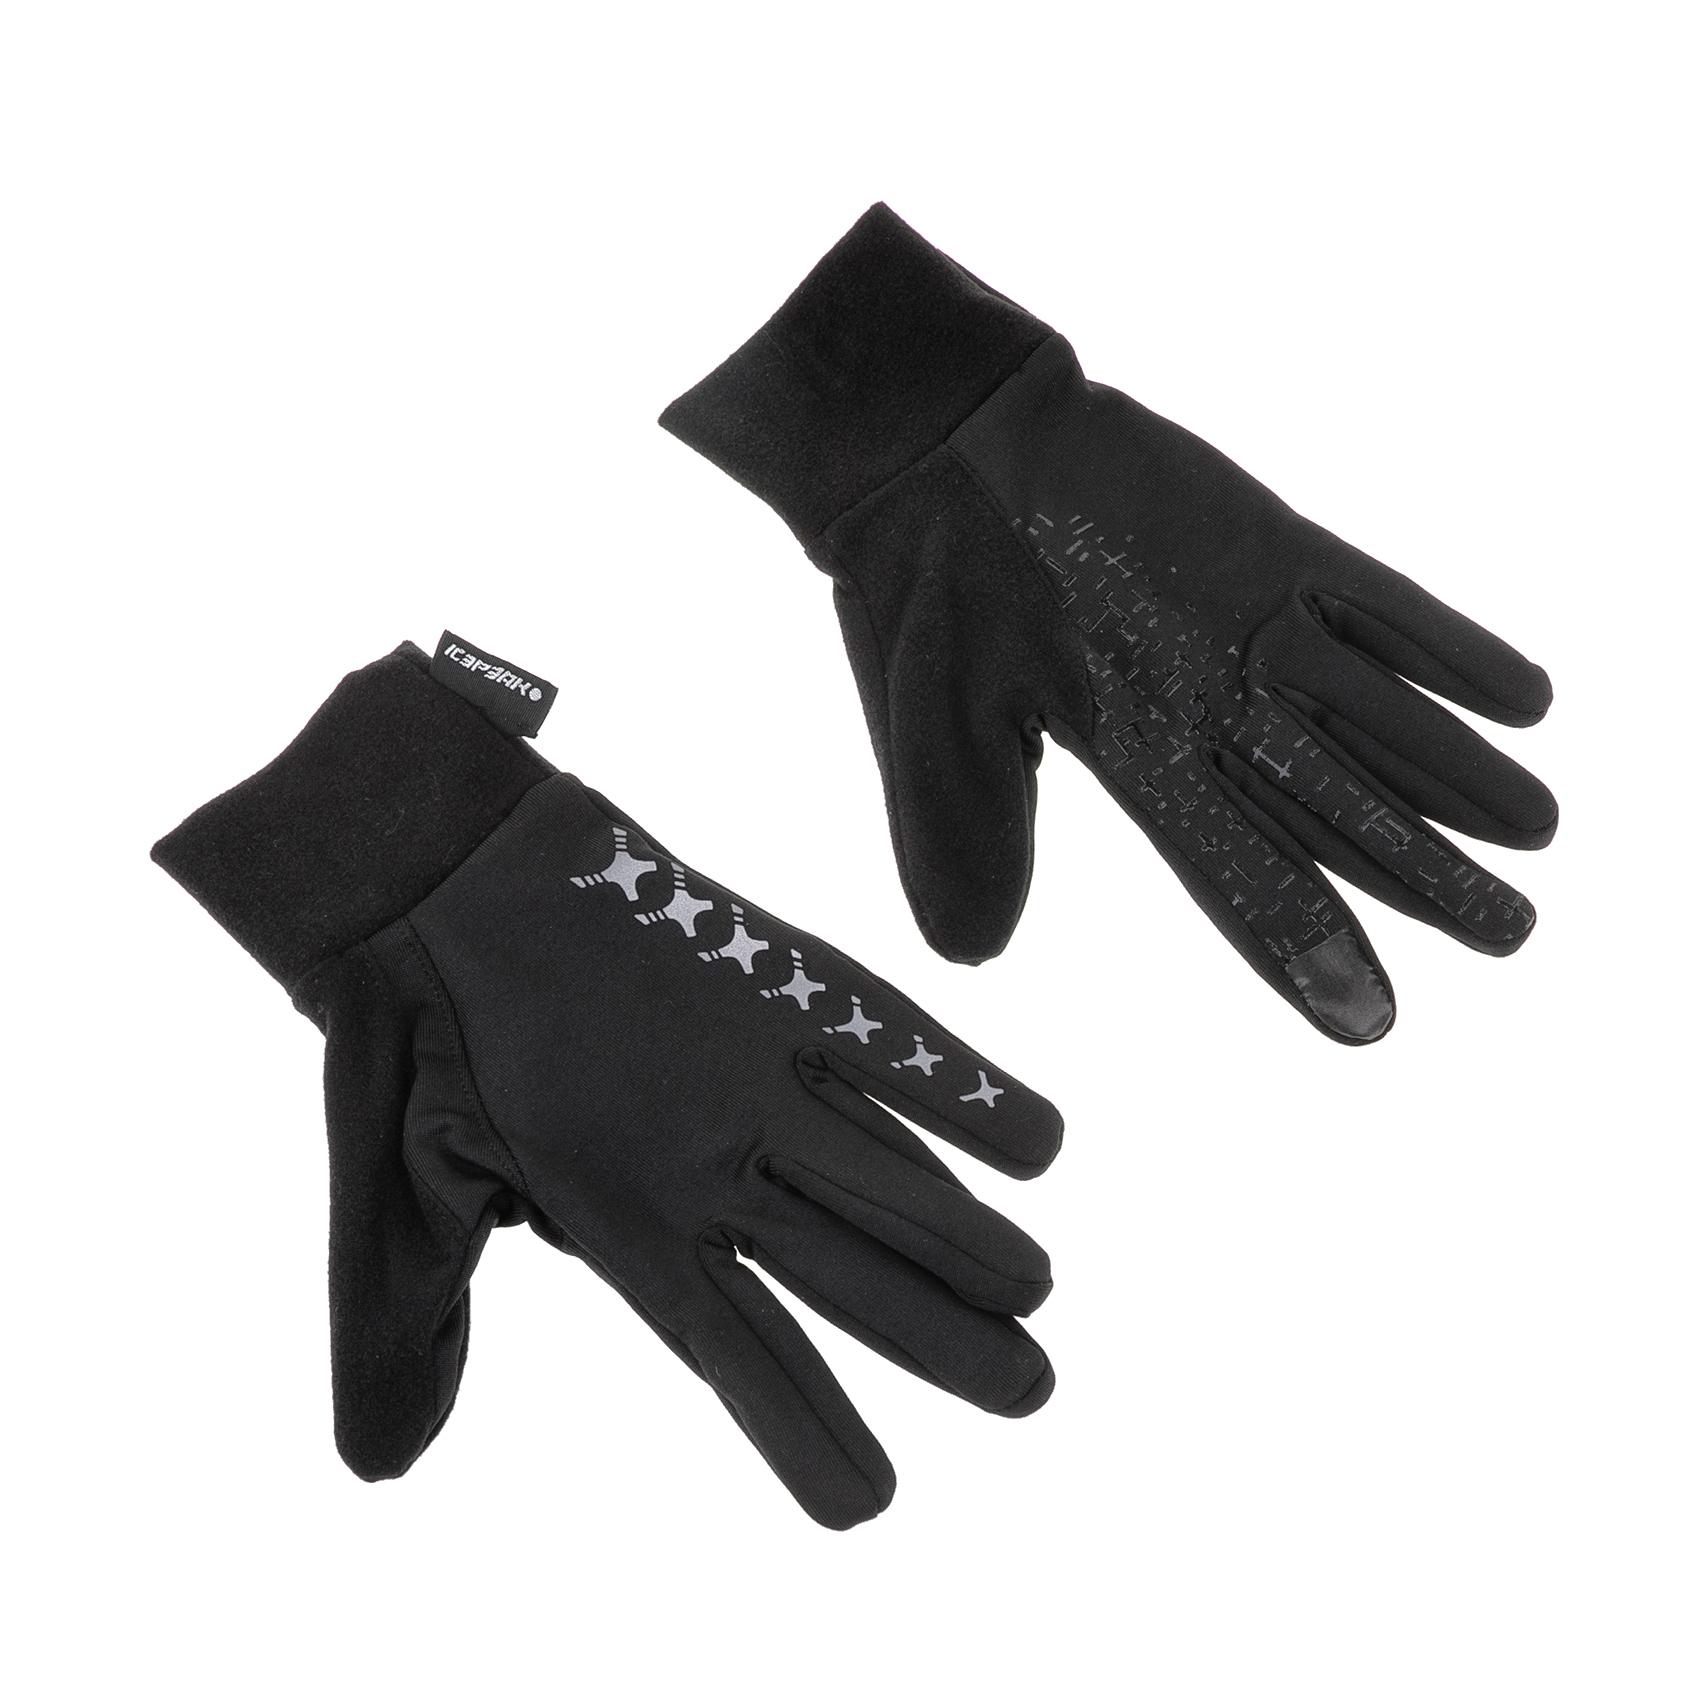 ICE PEAK - Unisex γάντια ορειβασίας Ice Peak HANSA μαύρα γυναικεία αξεσουάρ φουλάρια κασκόλ γάντια